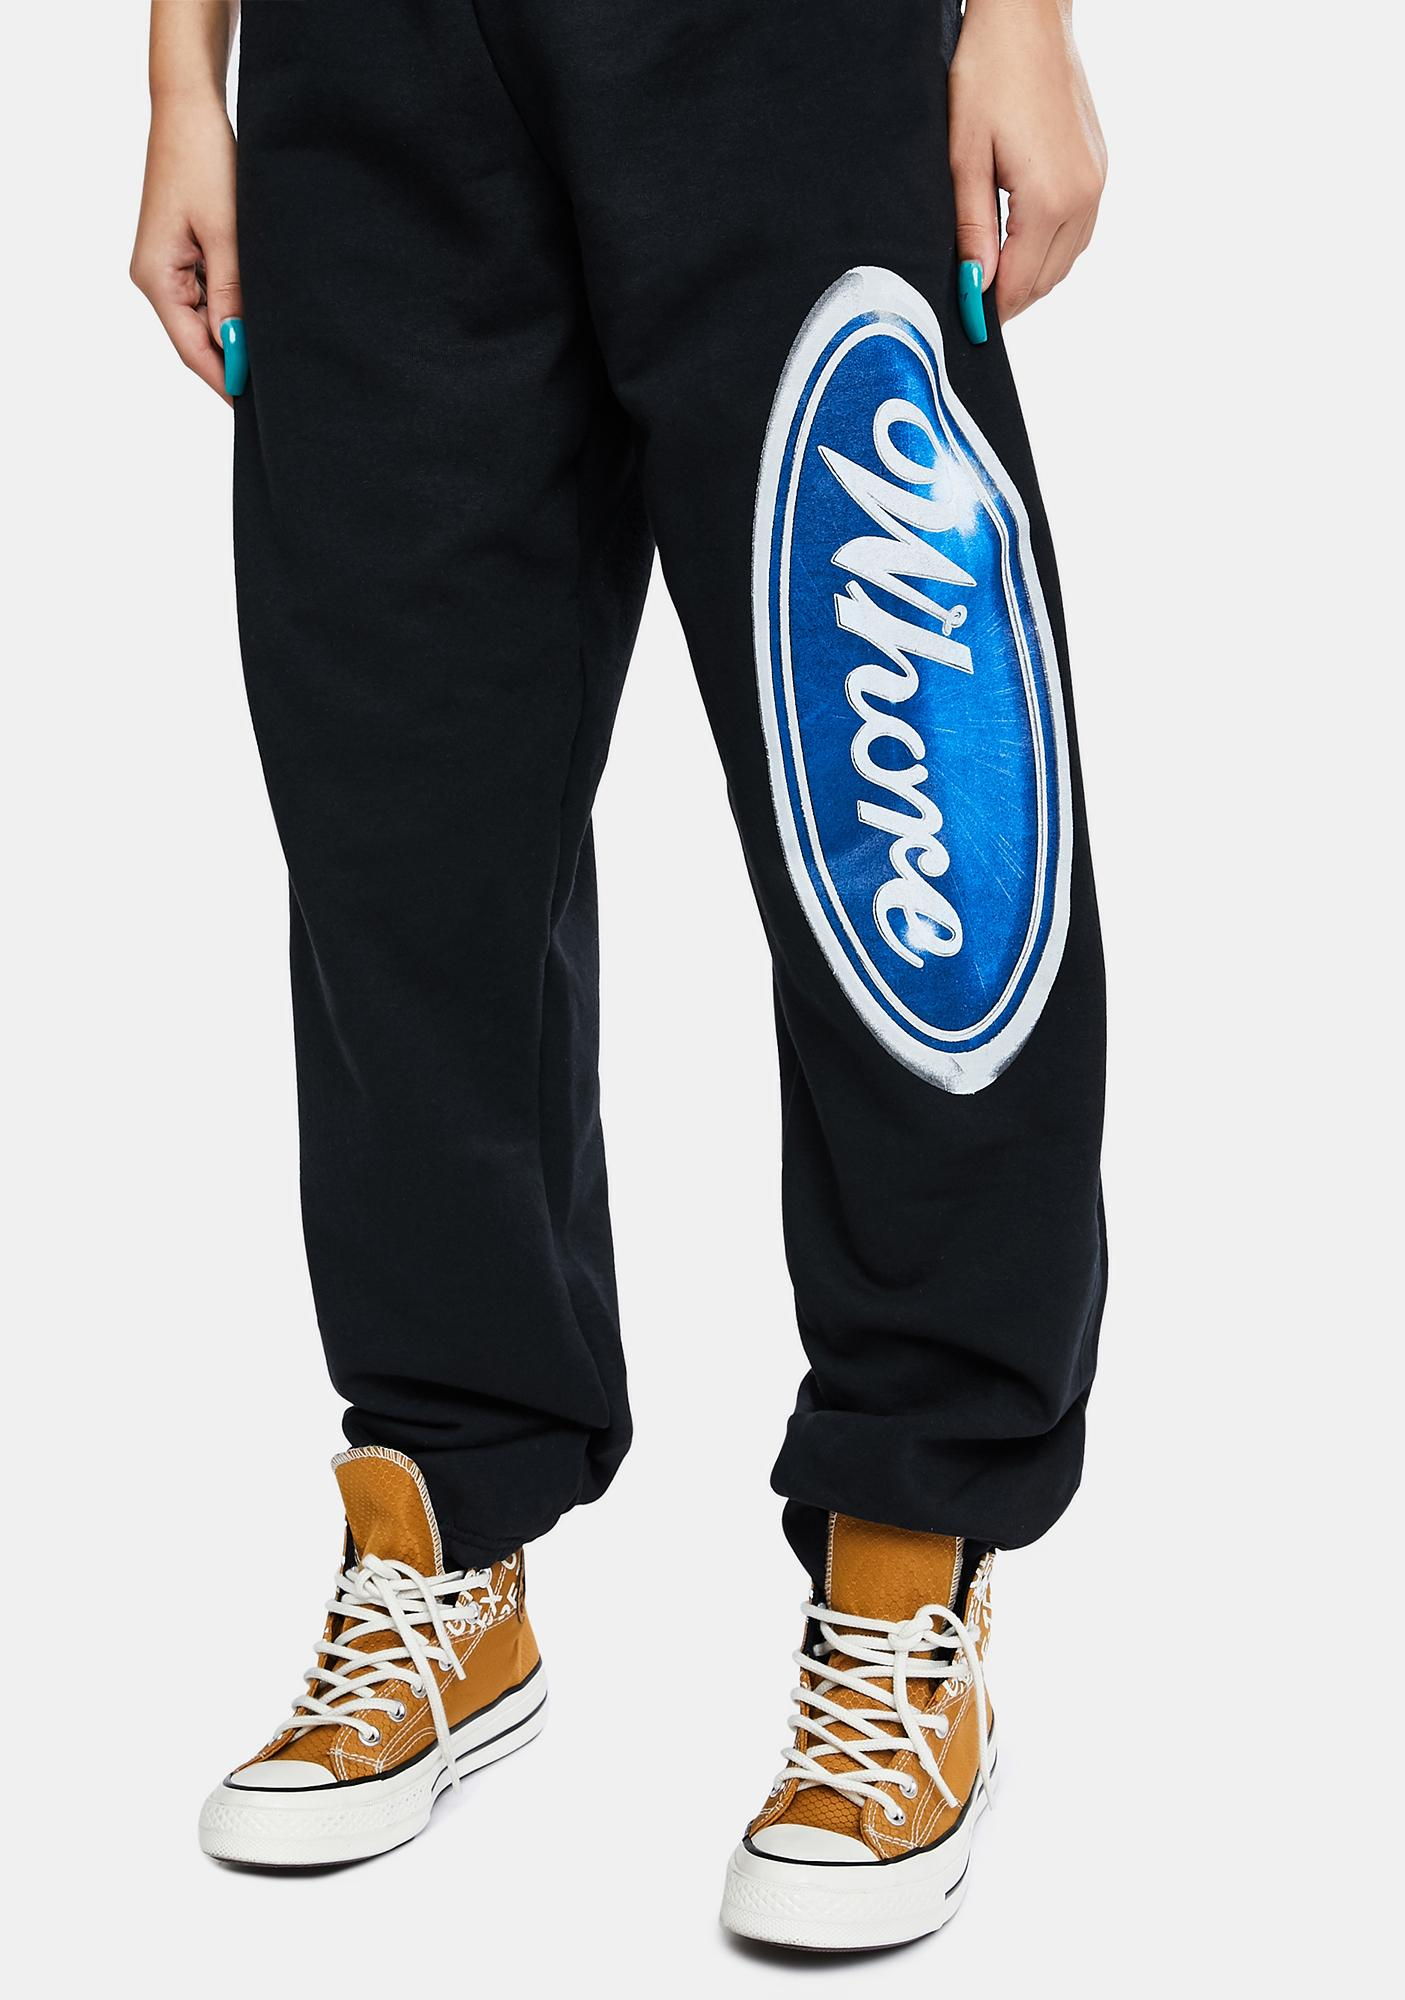 Dreamboy Whore Sweatpants